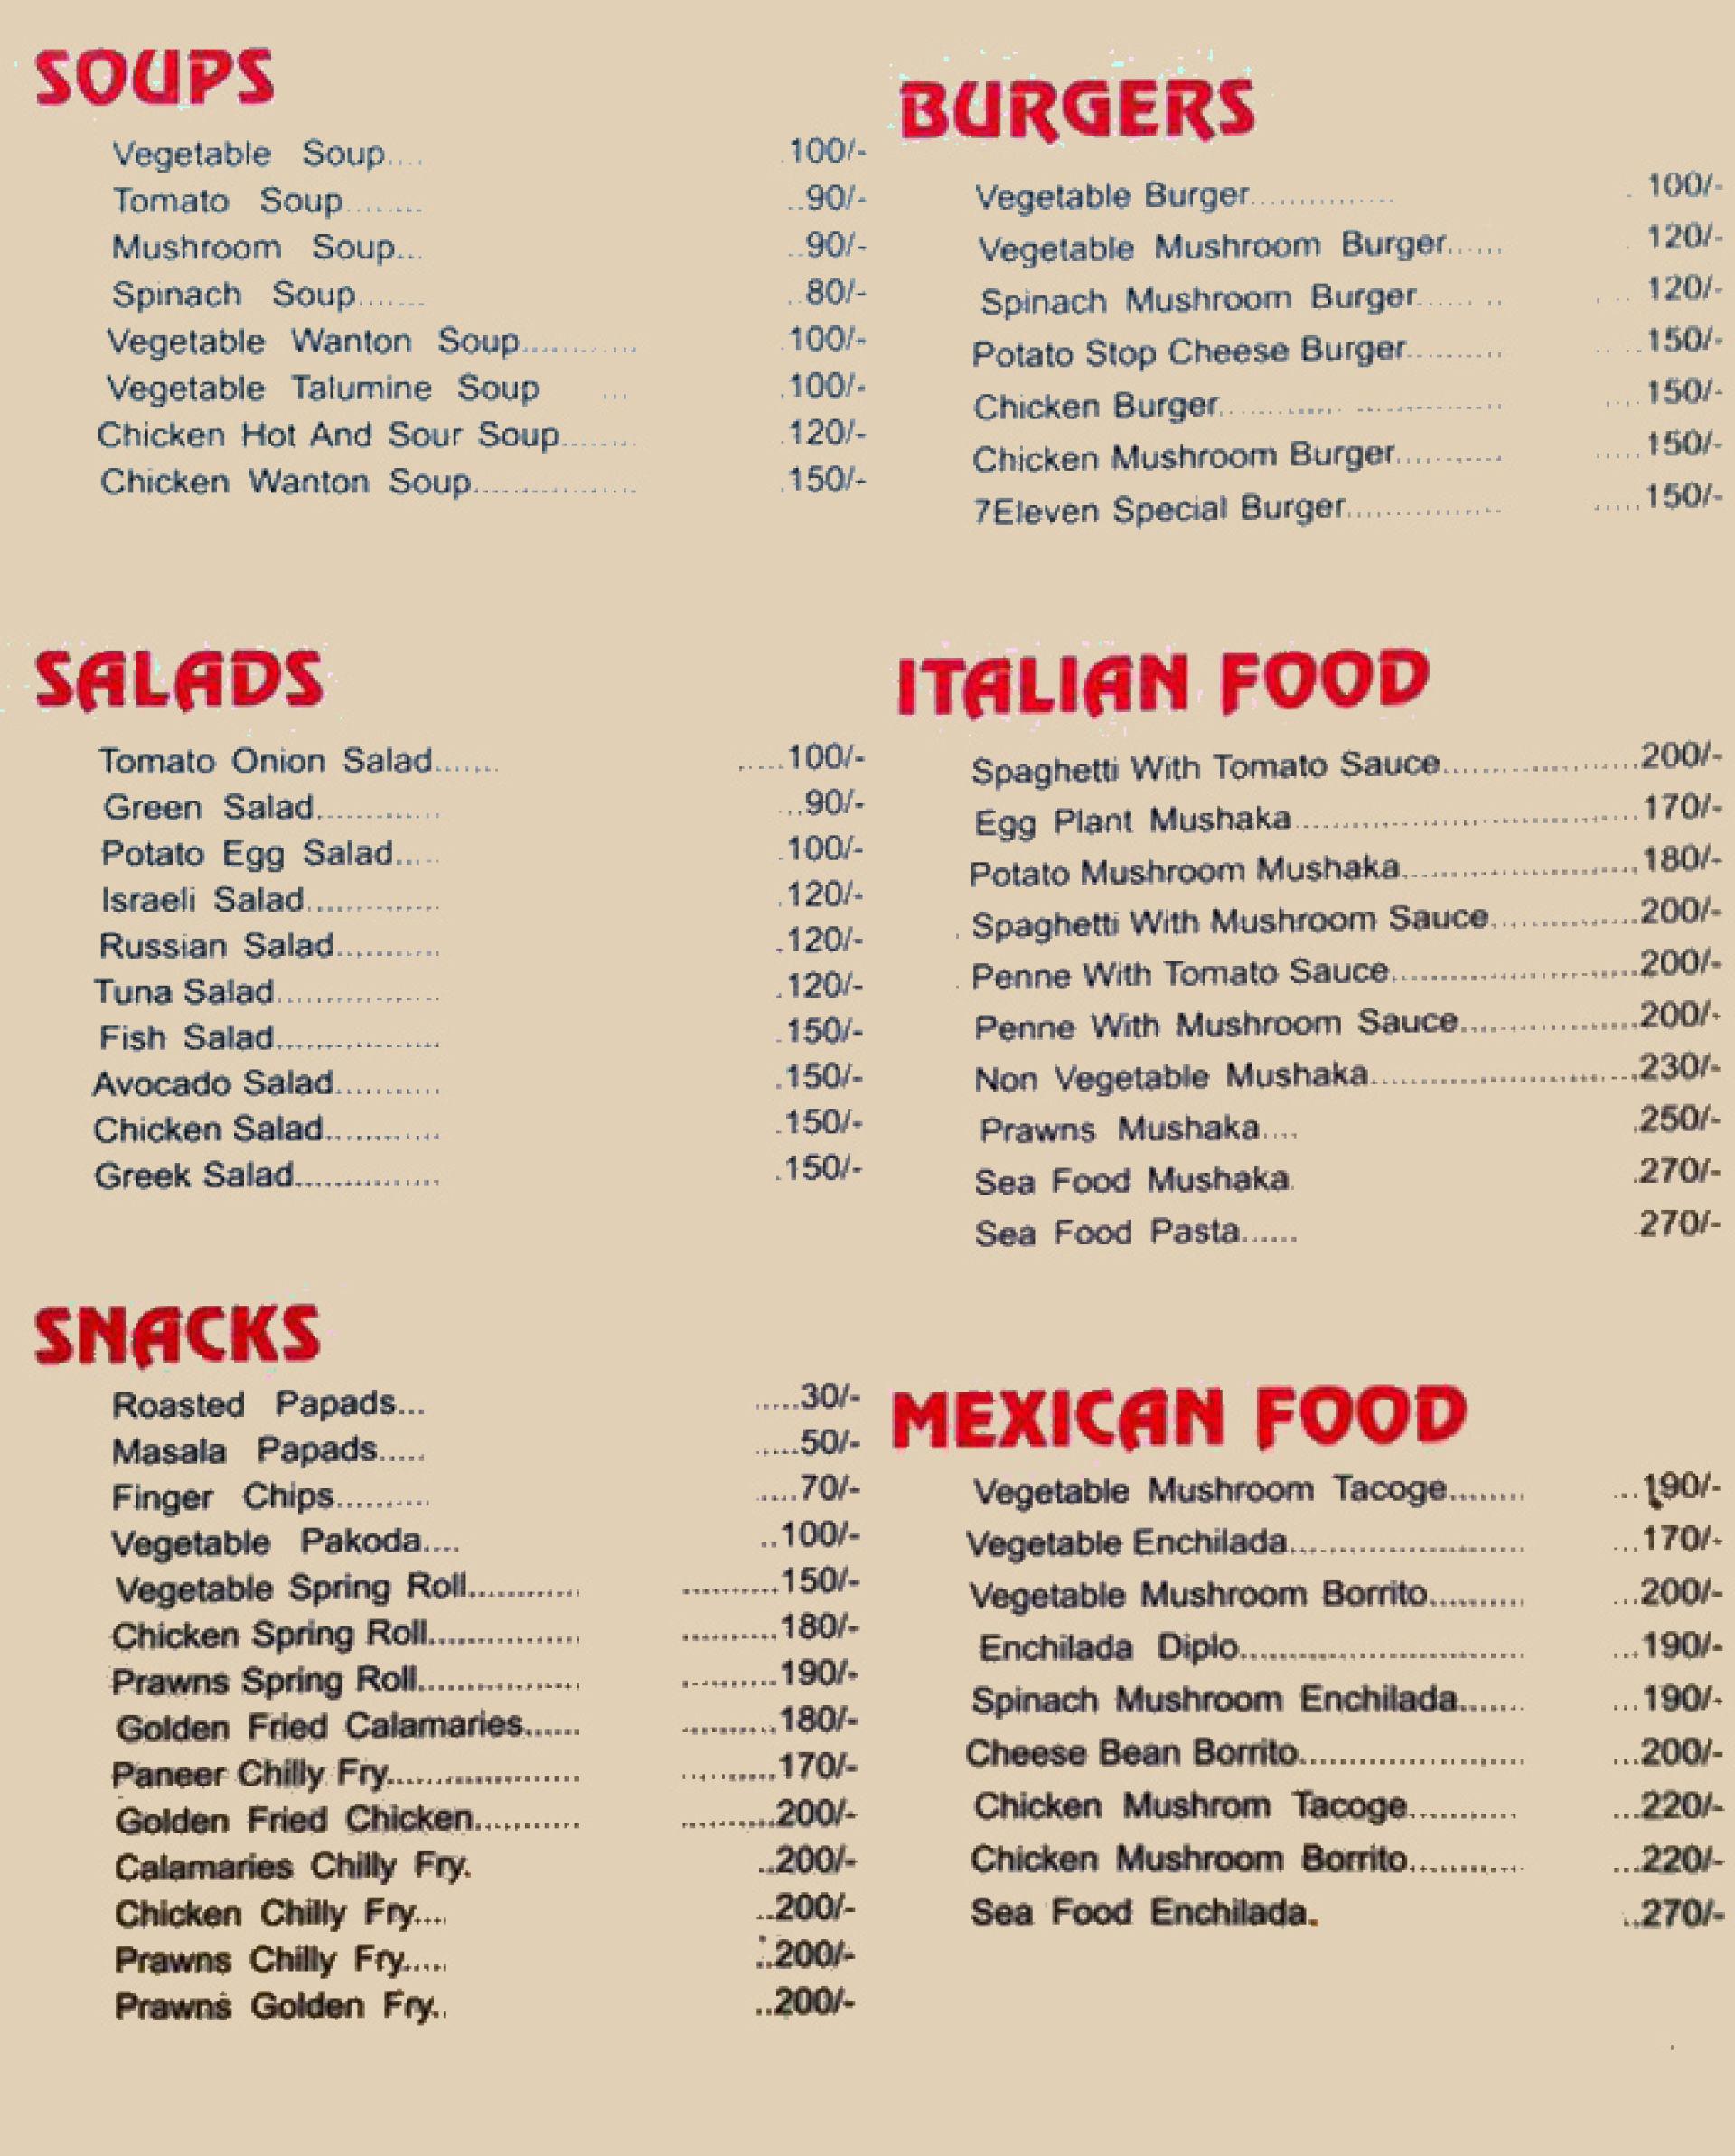 7 Eleven Anjuna North Goa Goa Restaurants Menu And Reviews